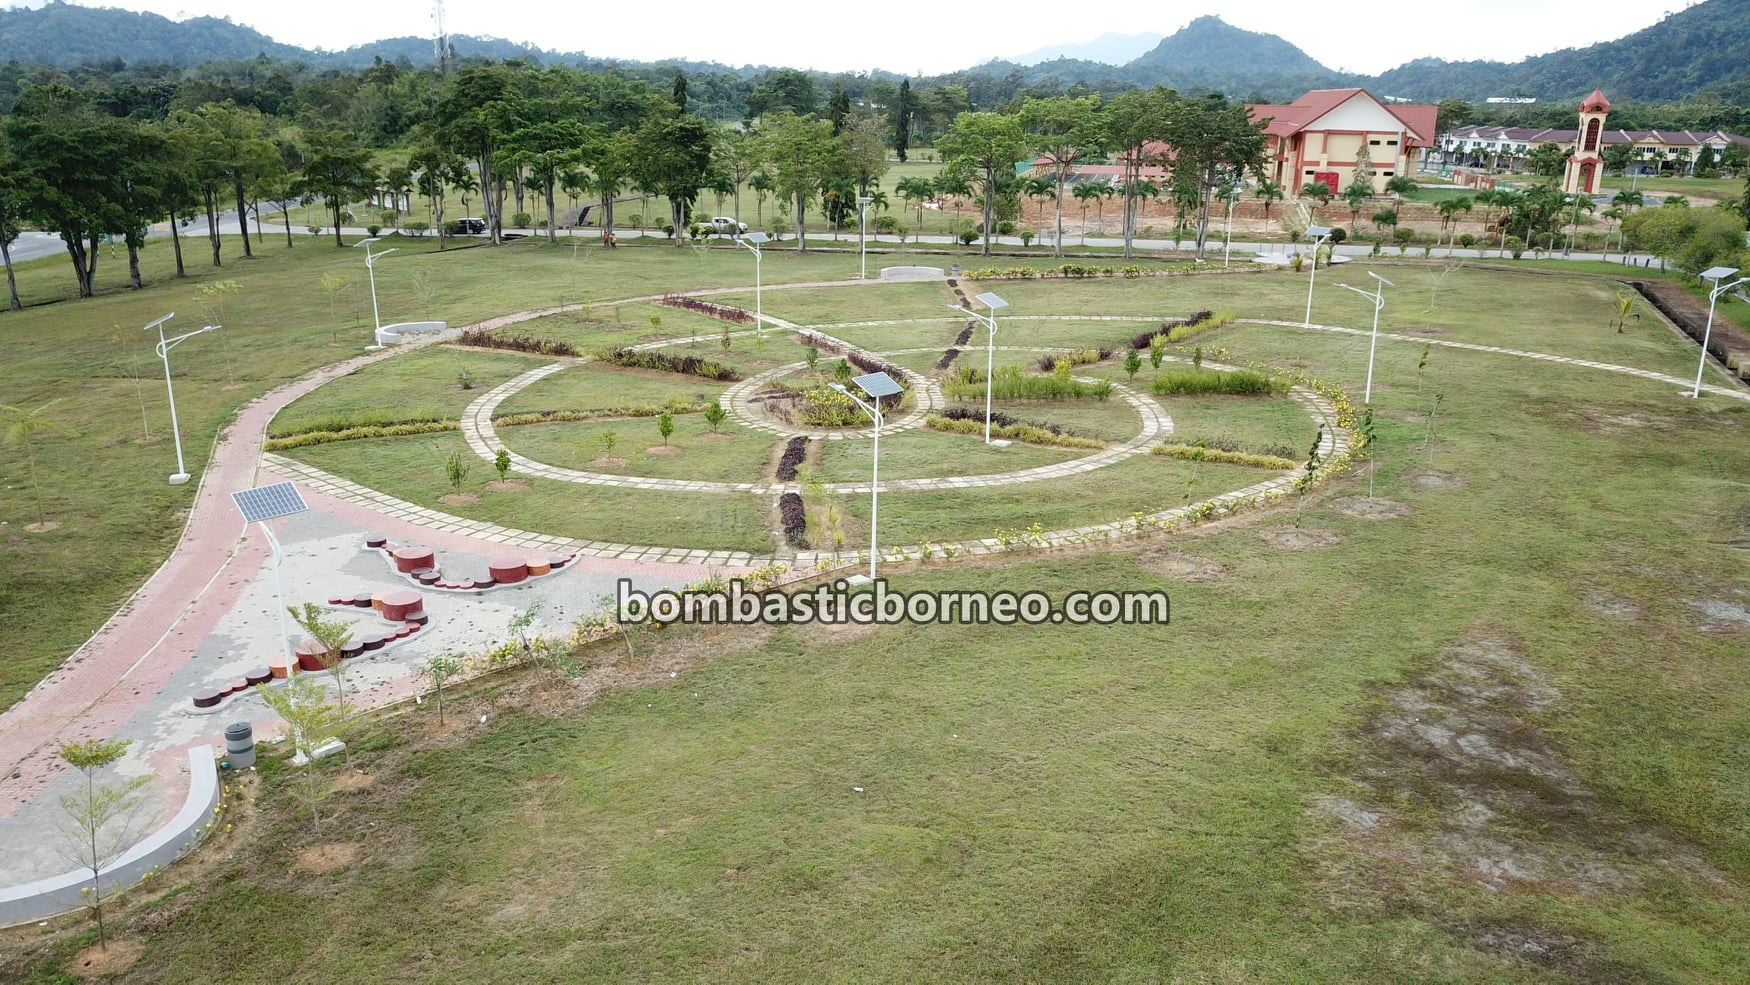 KLB Garden, Agro Park, backpackers, destination, exploration, Malaysia, objek wisata, Tourism, travel guide, Trans Borneo, 马来西亚砂拉越, 西连打必律旅游胜地,